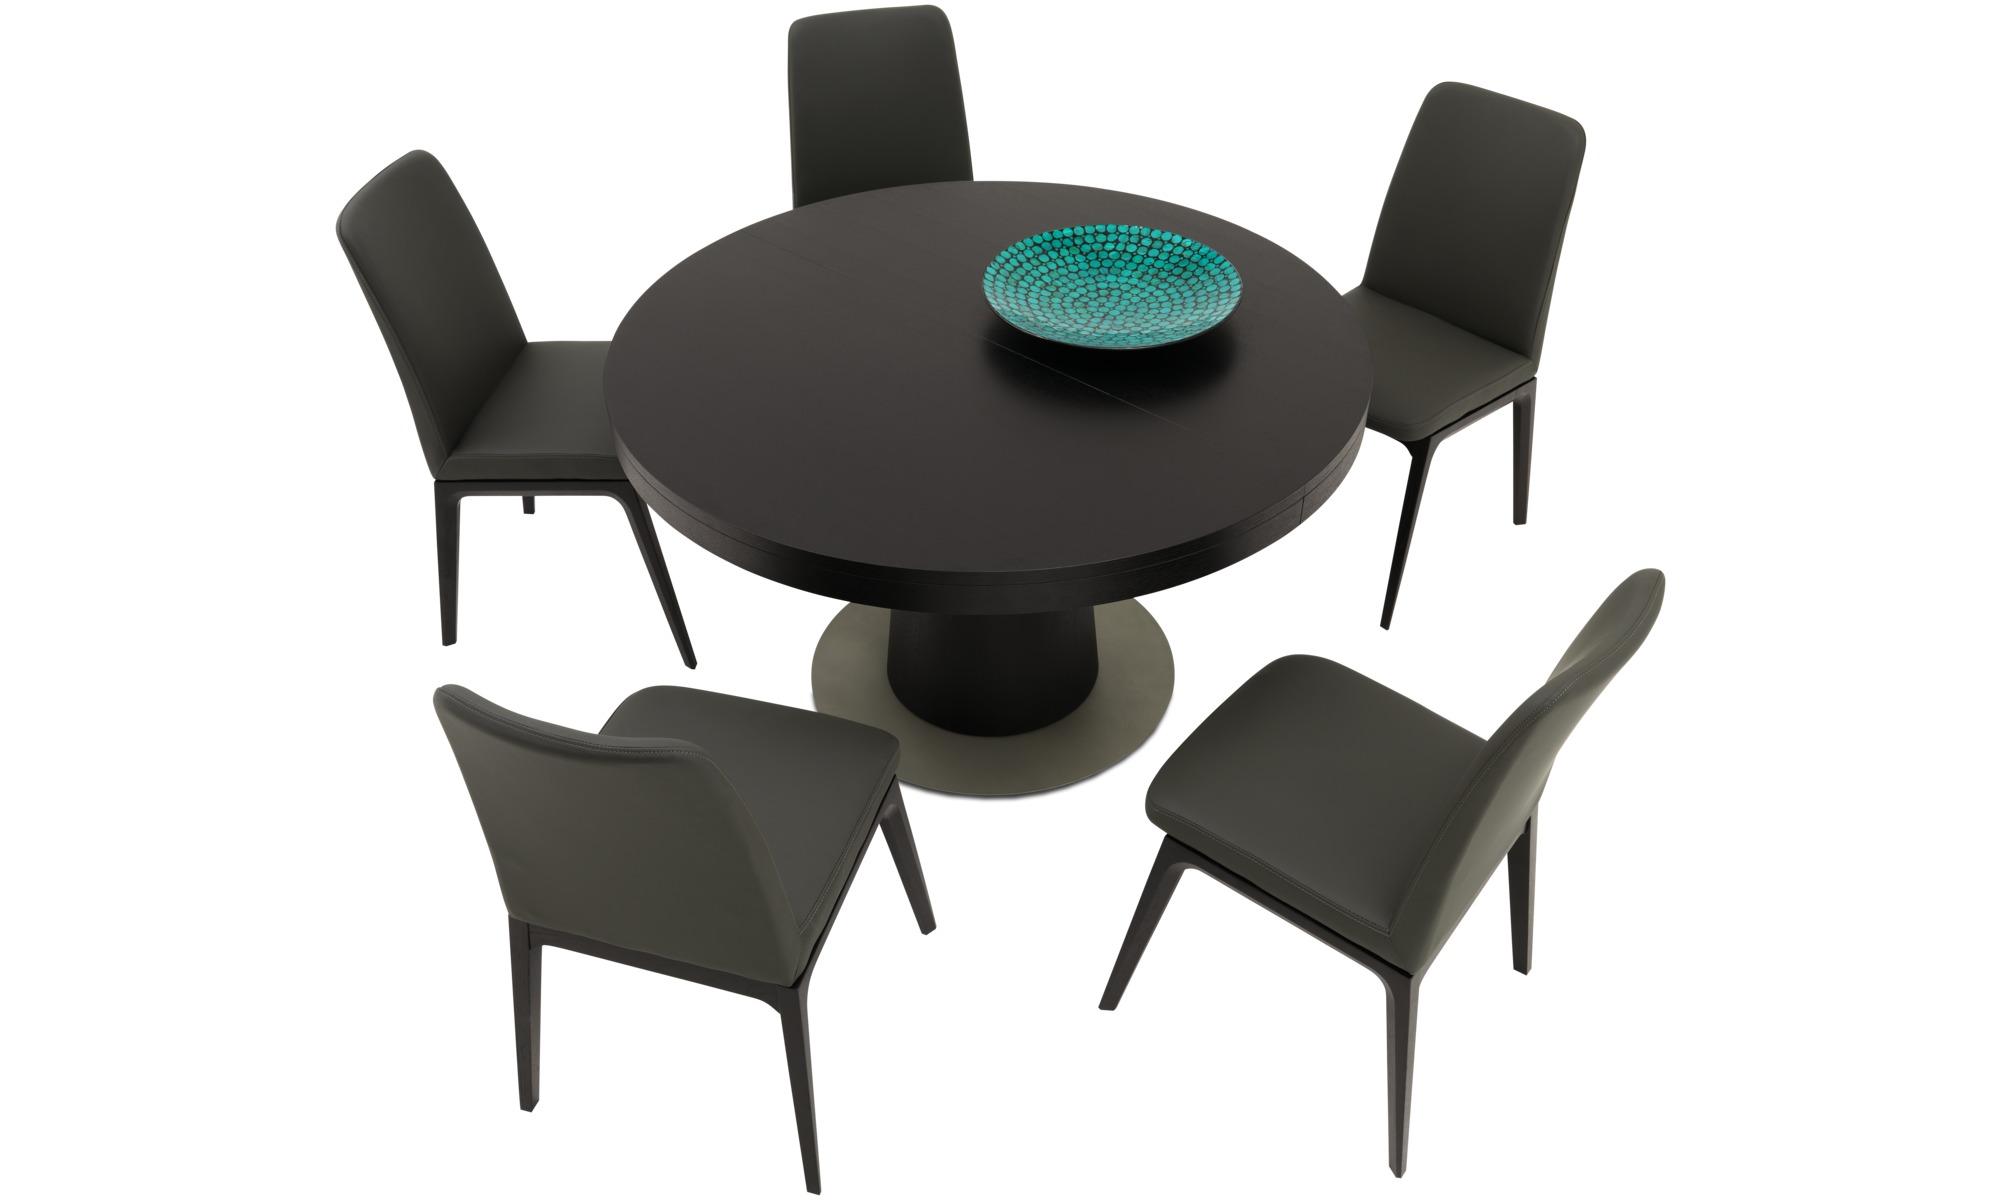 esszimmerst hle lausanne stuhl boconcept. Black Bedroom Furniture Sets. Home Design Ideas